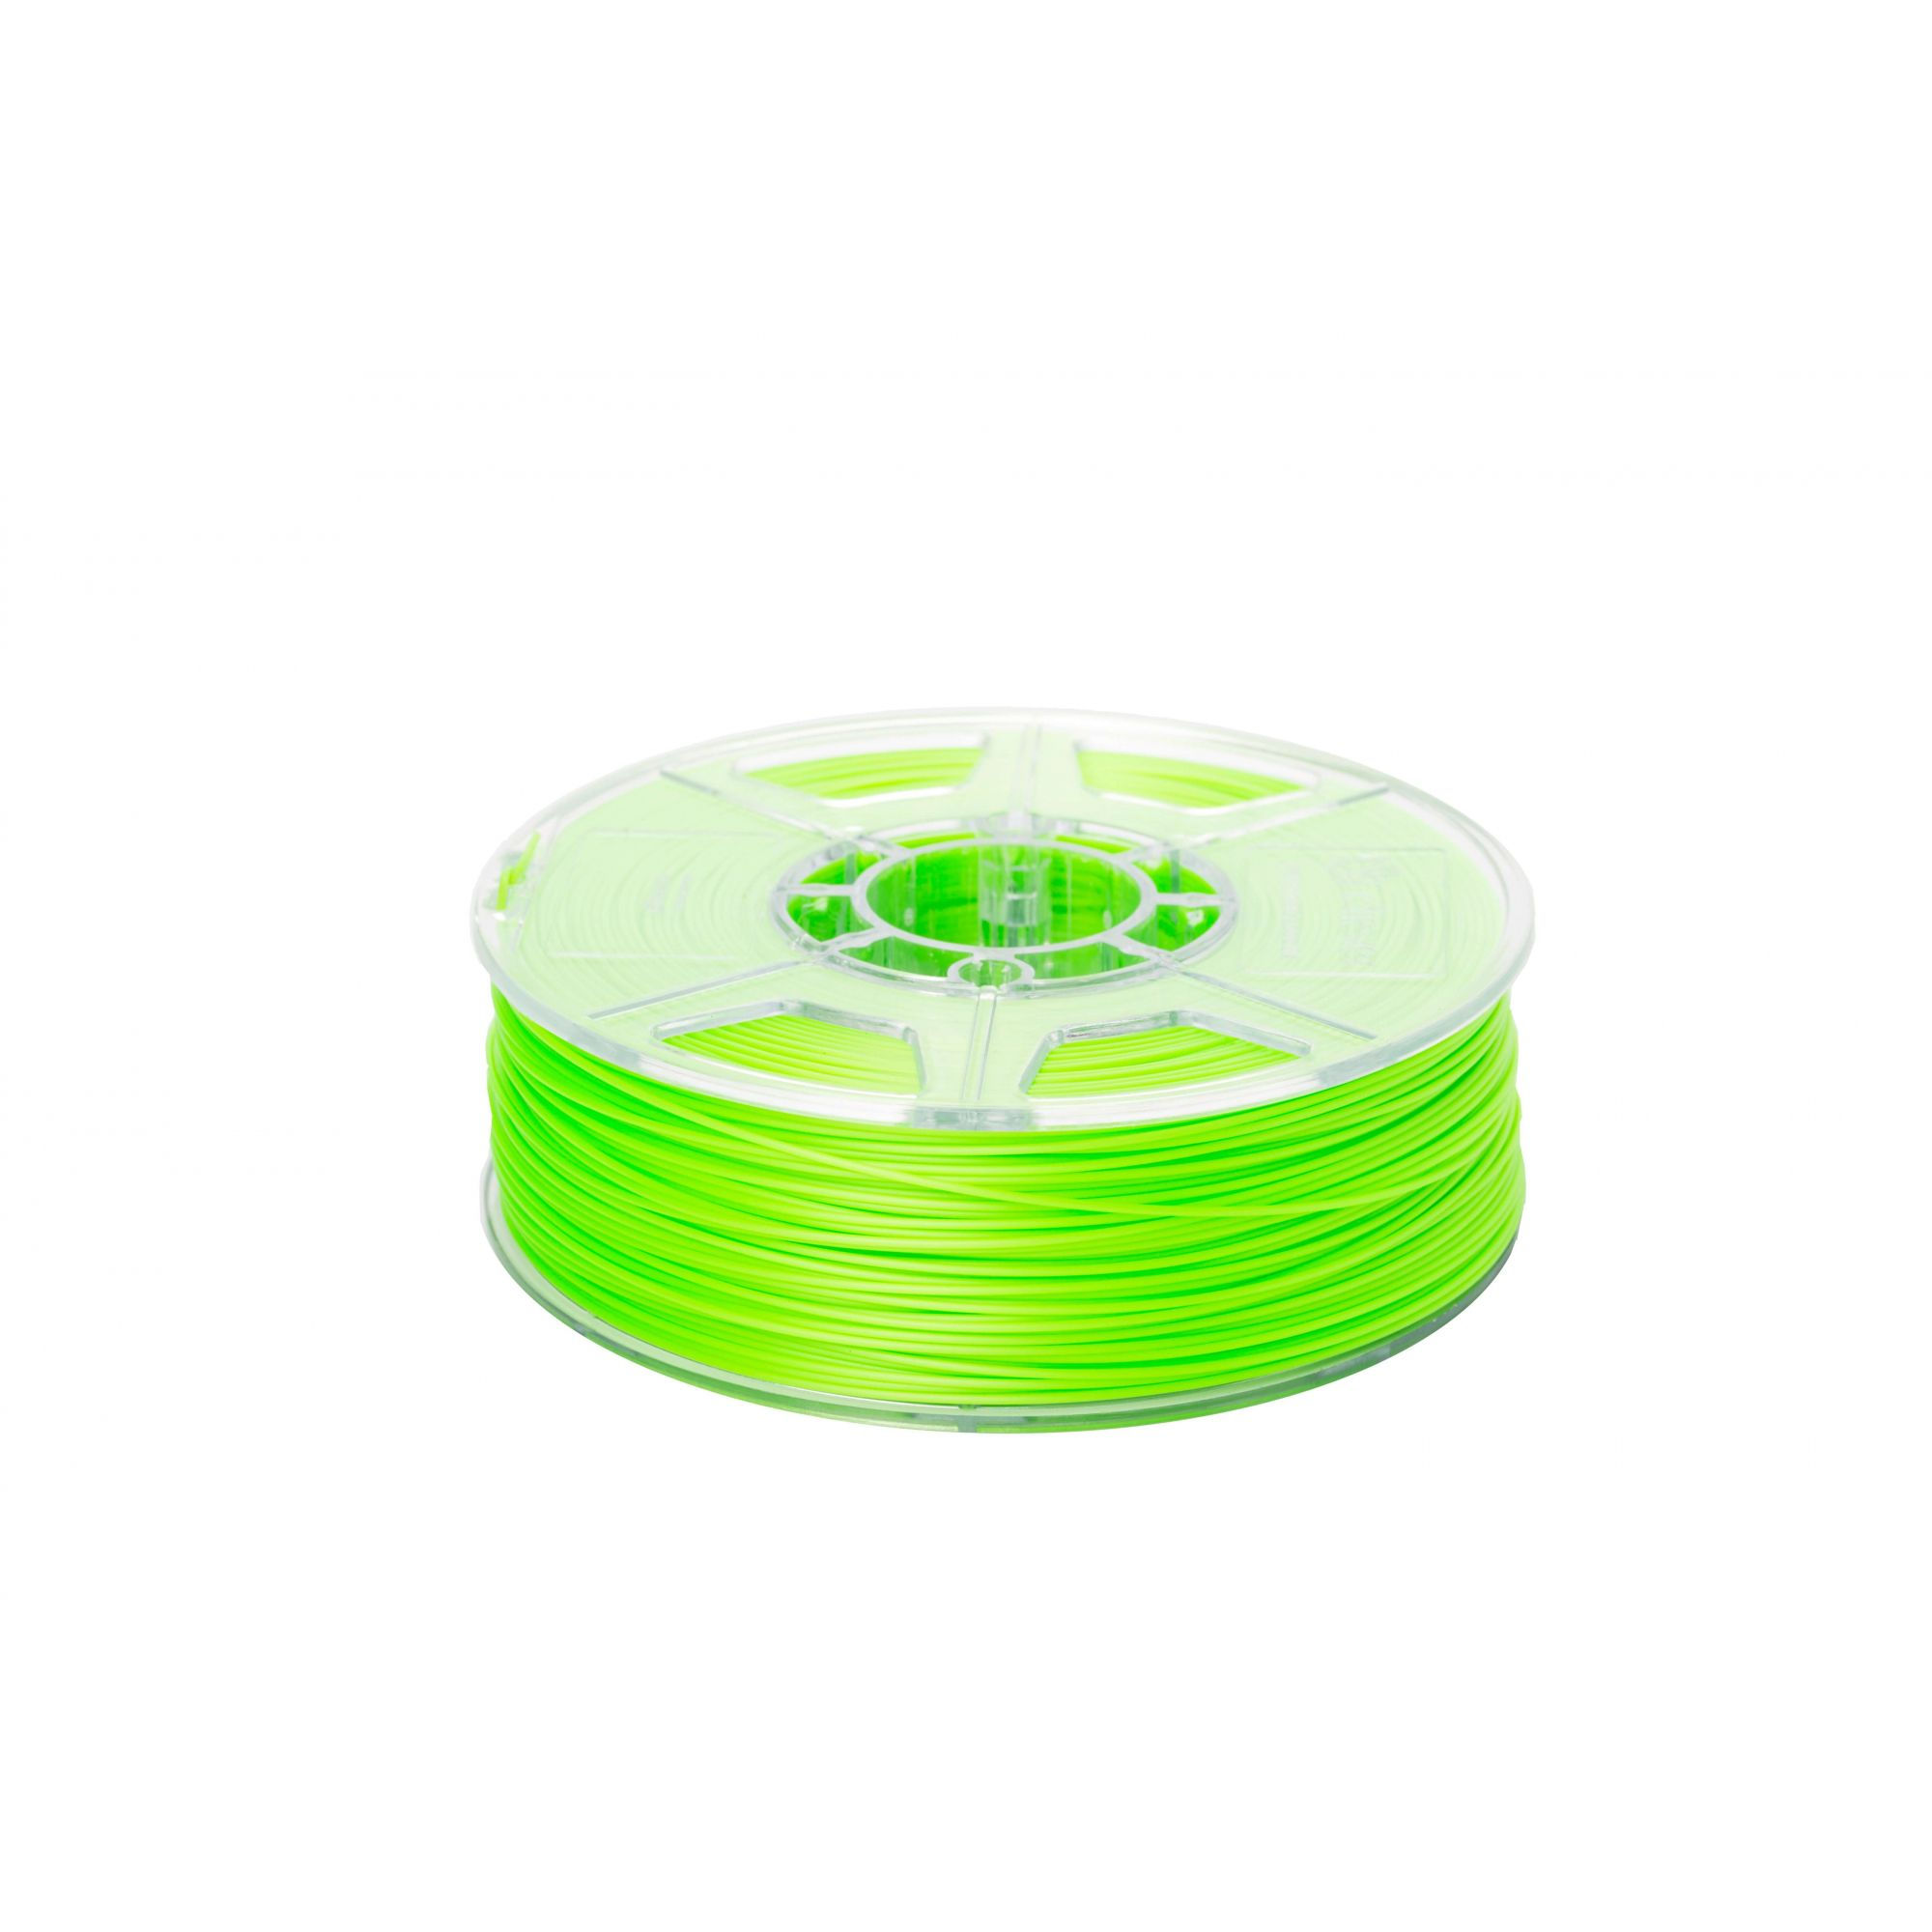 Filamento PLA - Verde Fluorescente - Cliever - 1.75mm - 1kg